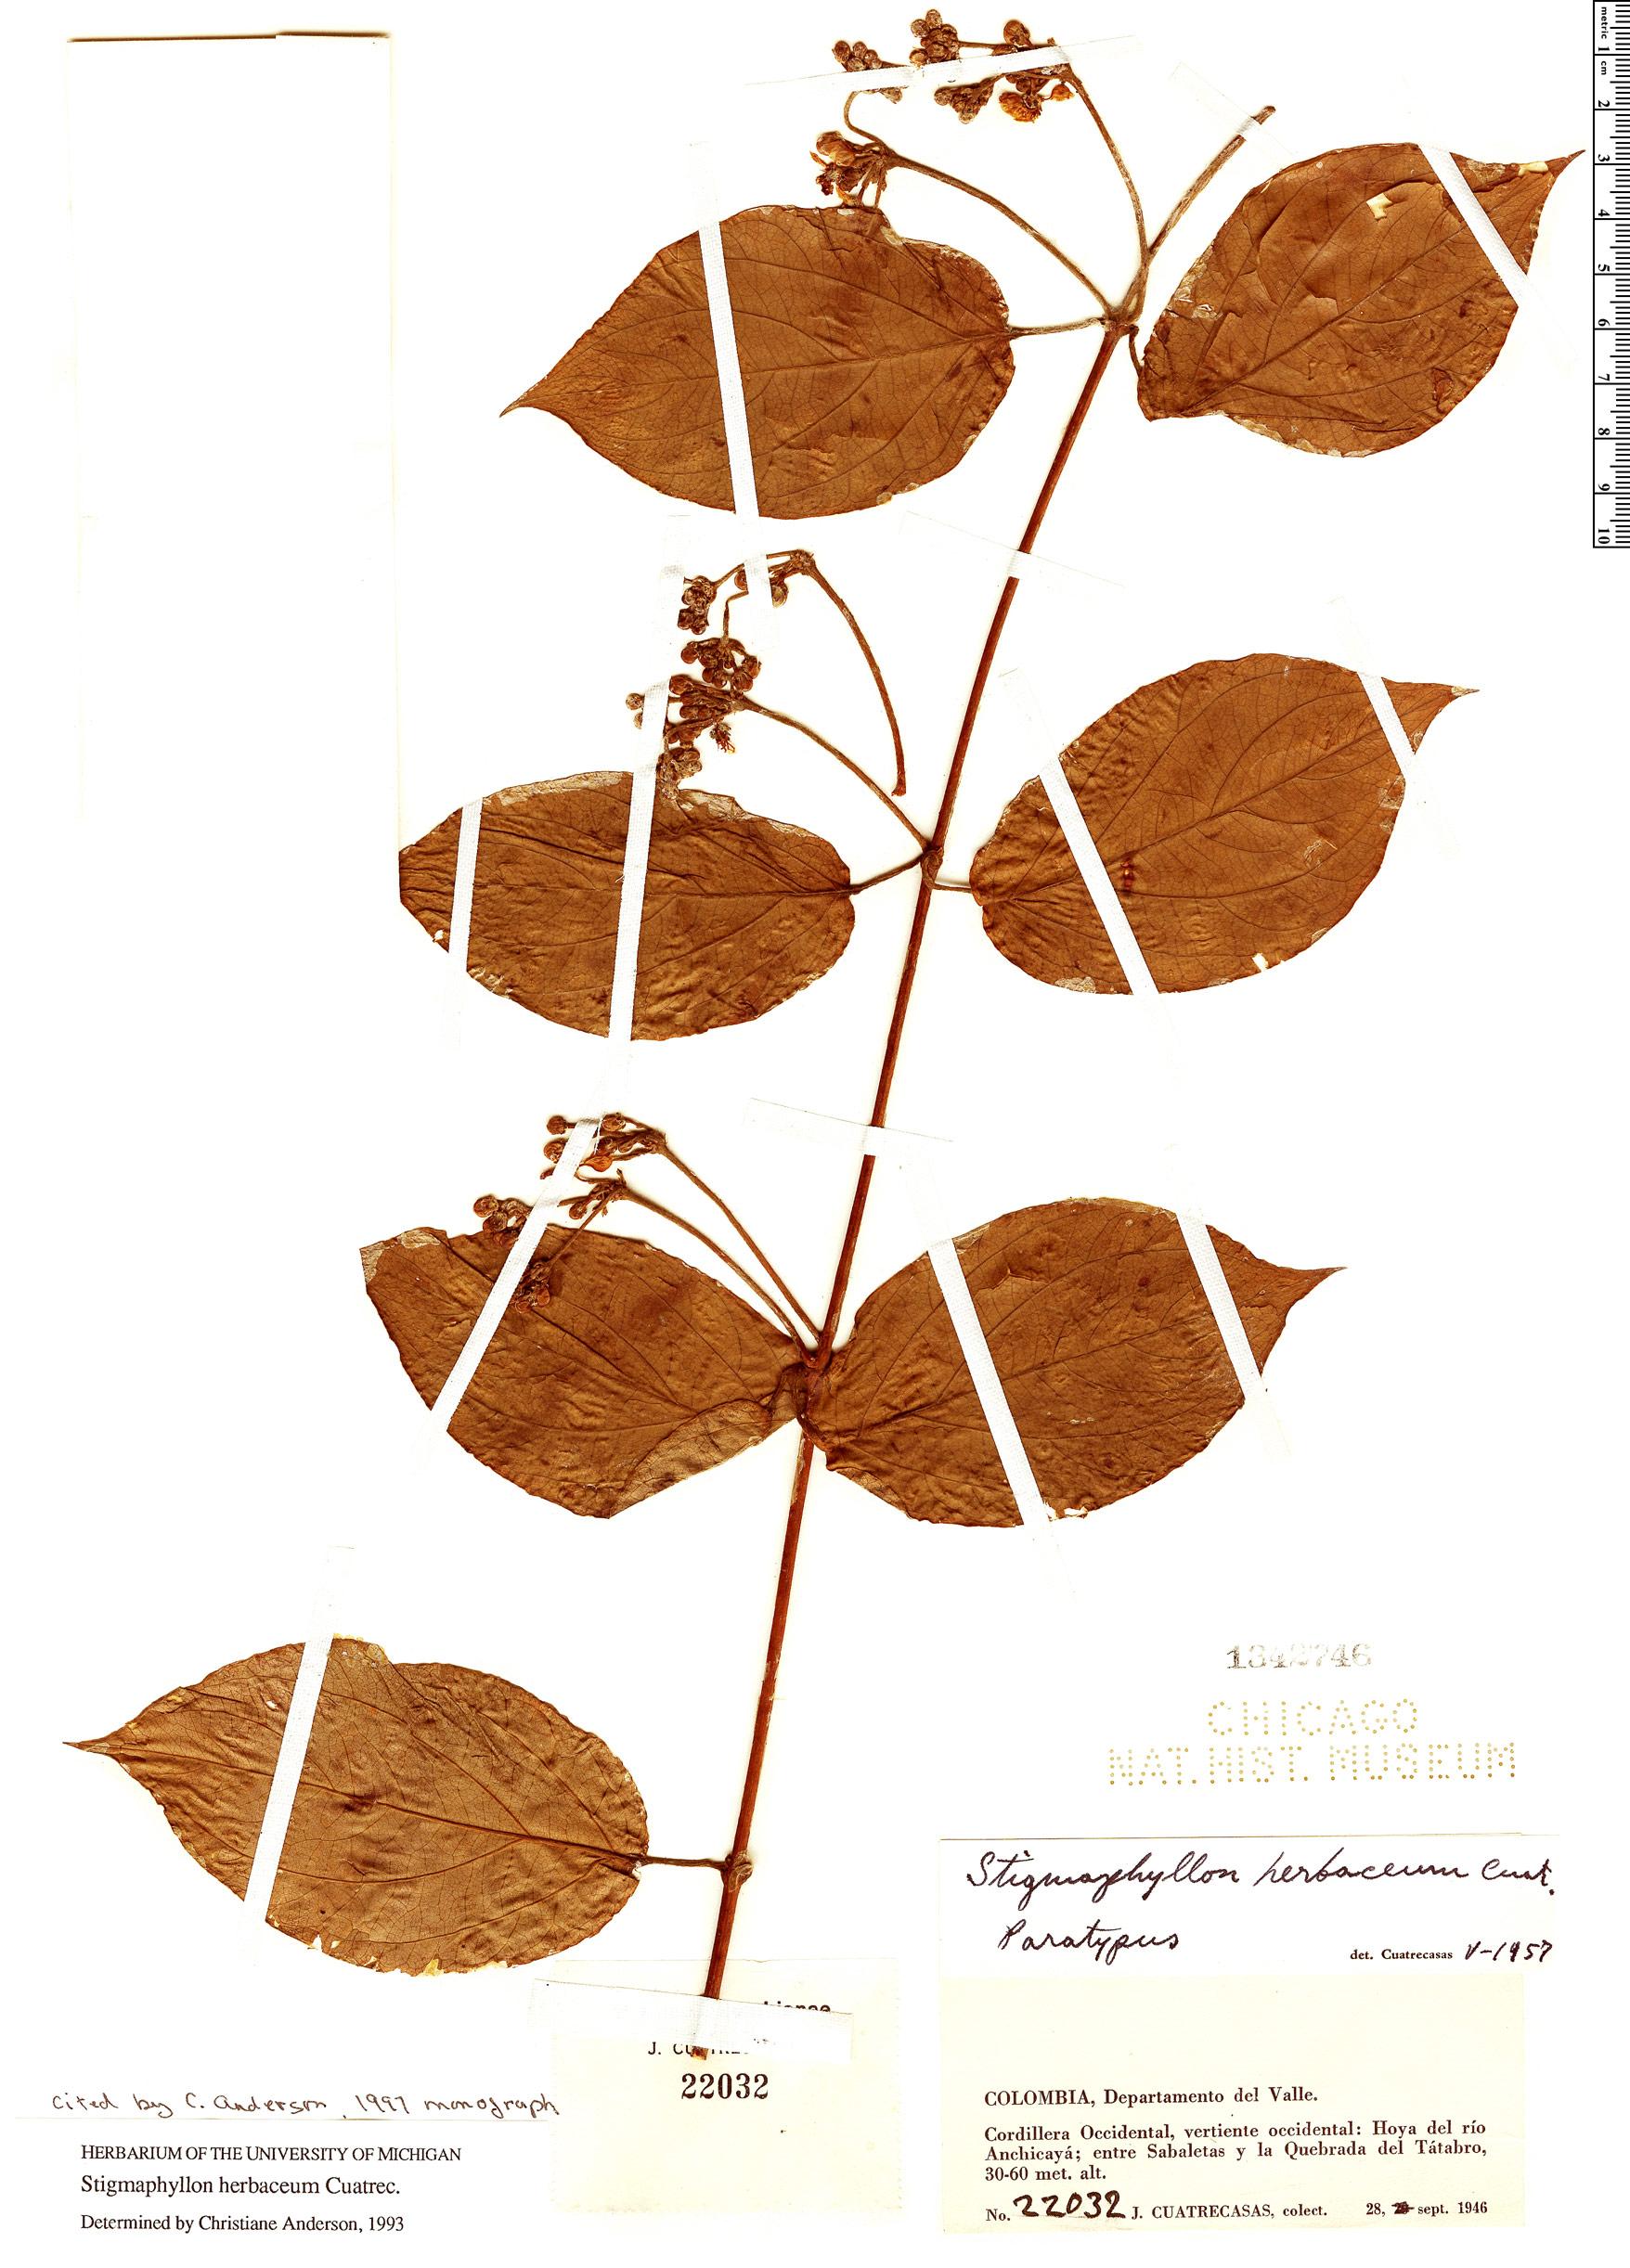 Specimen: Stigmaphyllon herbaceum